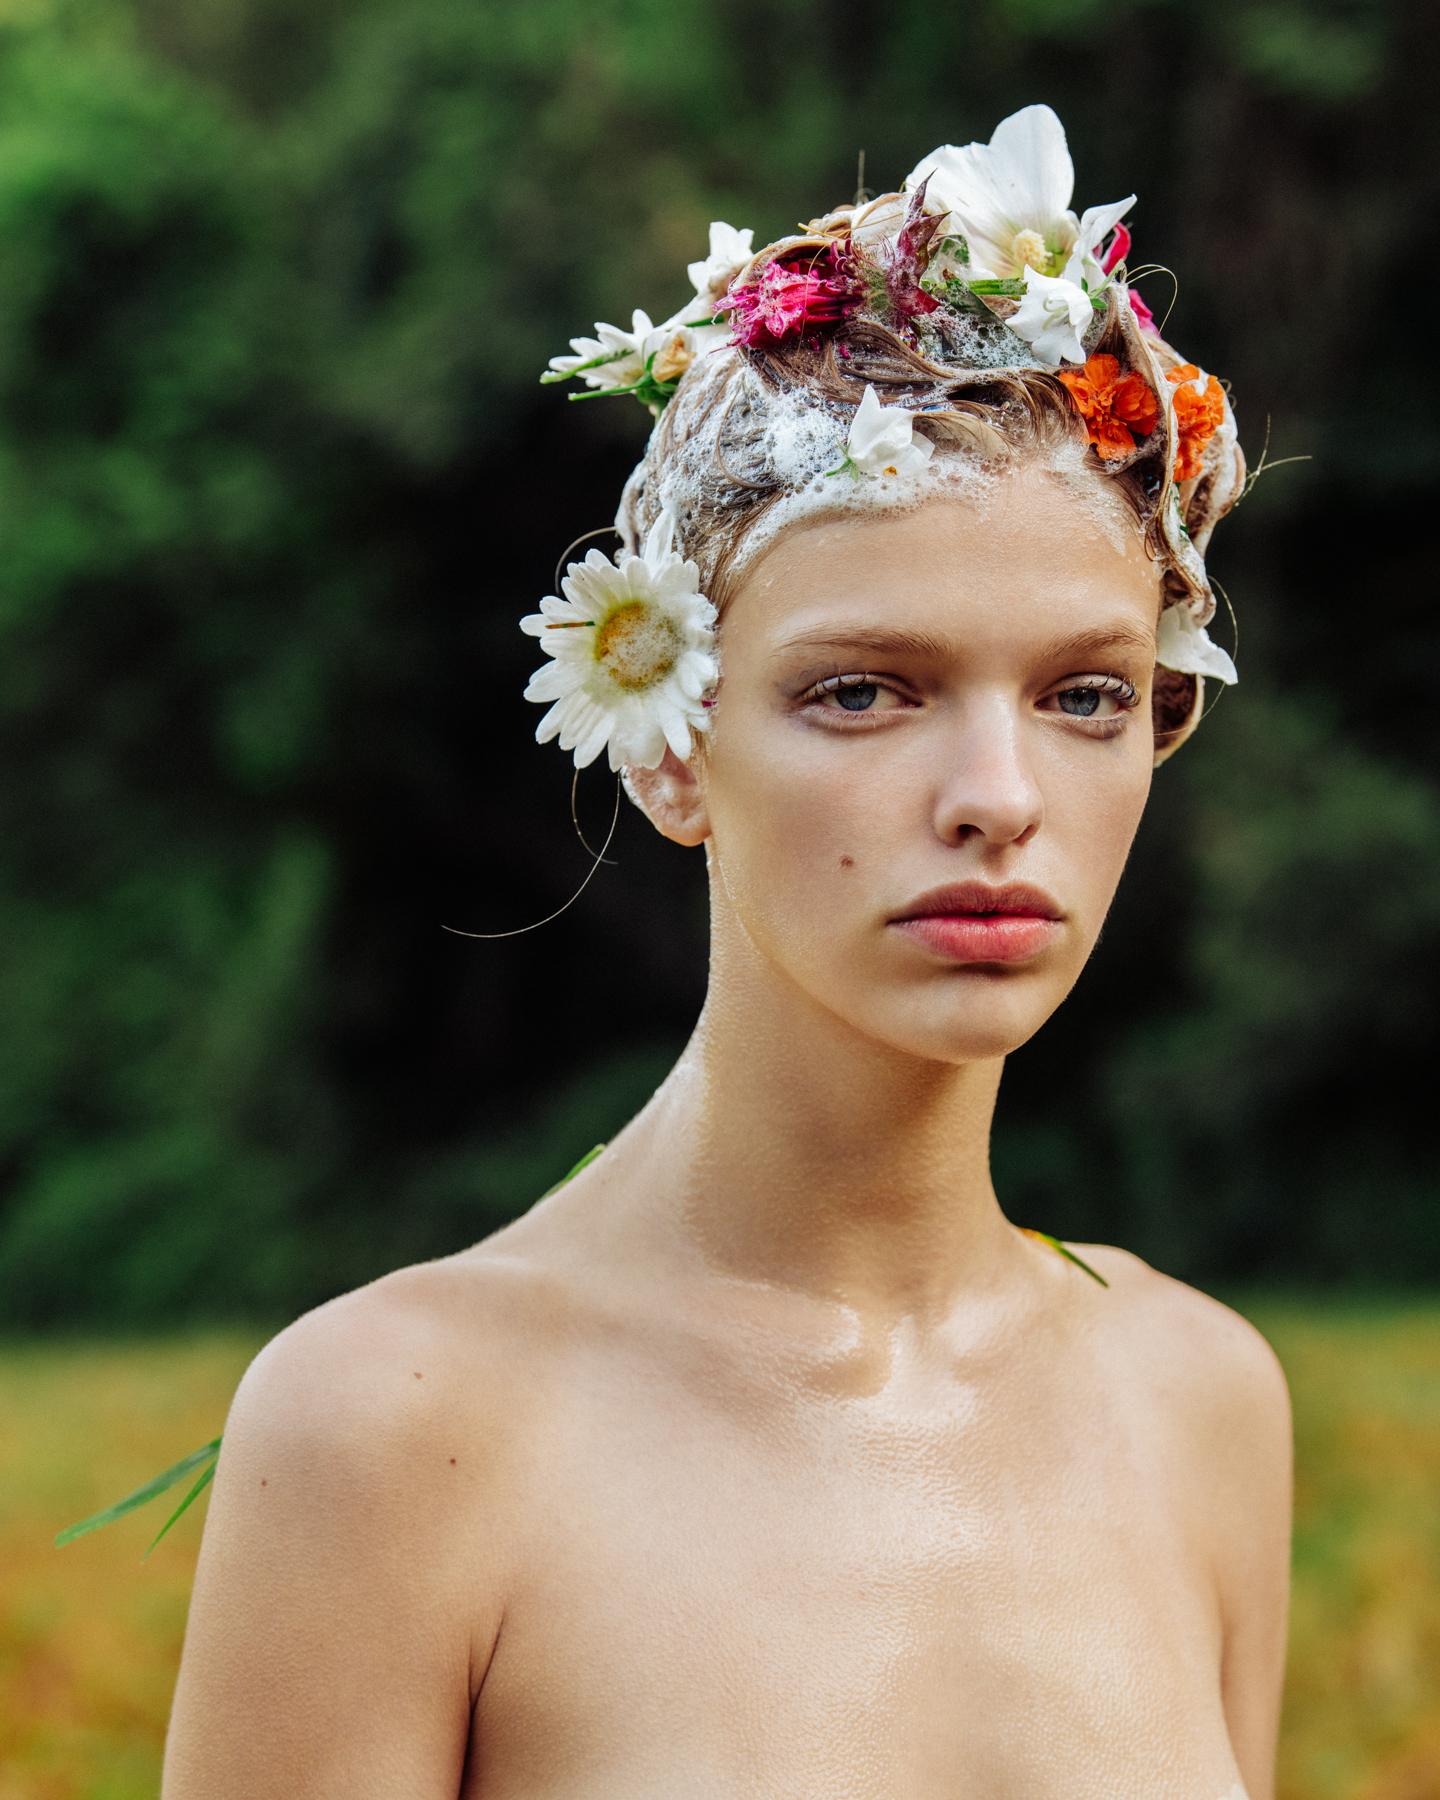 Clare-Crawford-by-Ivan-Bideac-for-Vogue-Italia-3794.jpg